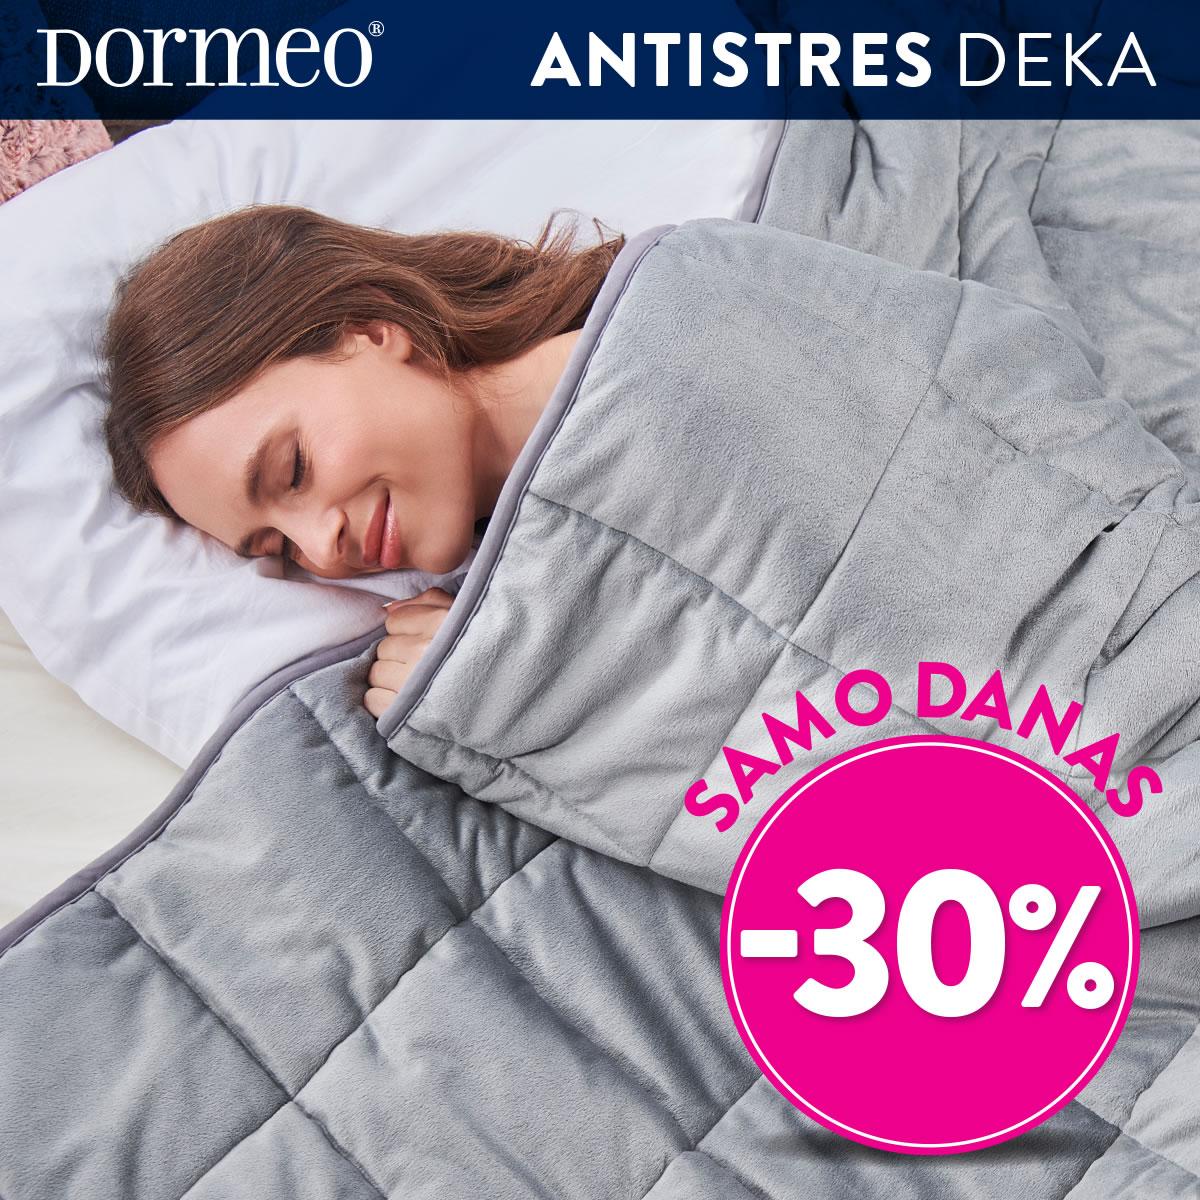 DormeoPlaviPonedjeljakAntistresDeka1200x1200